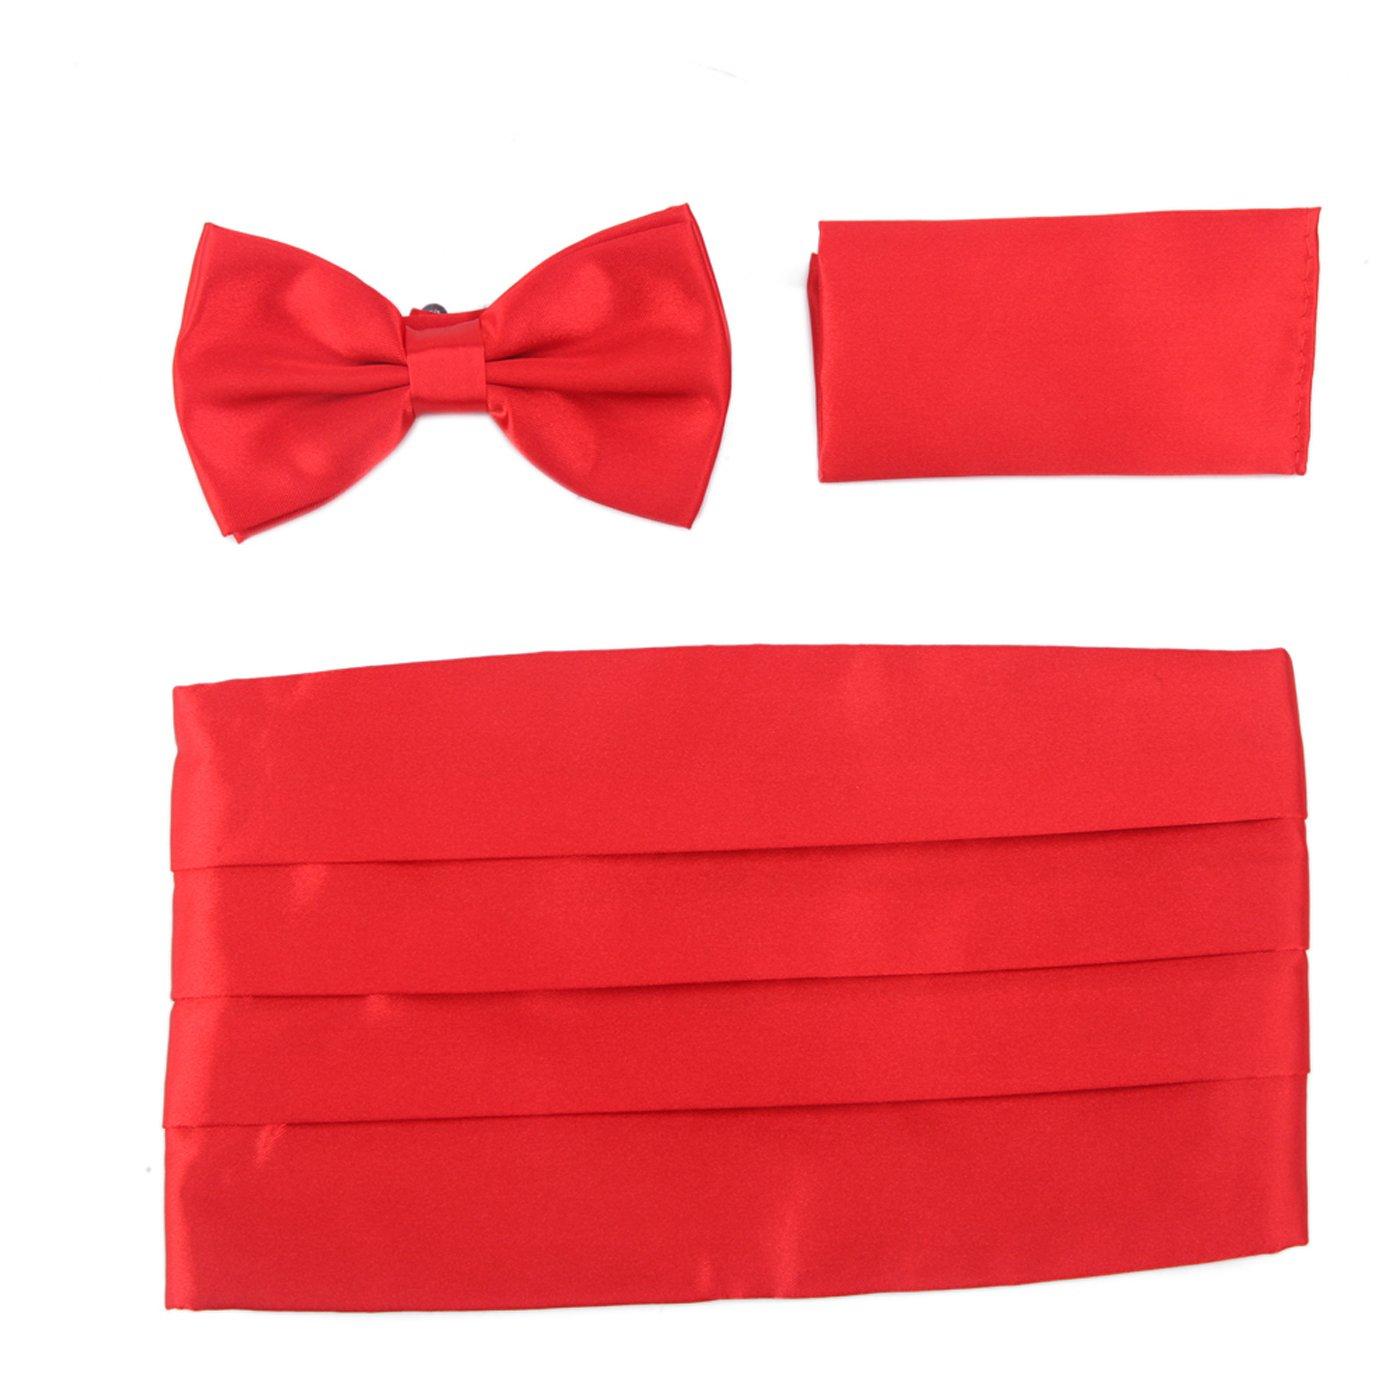 HDE Tuxedo Set Men's Formal Satin Blend Bow Tie, Cumberbund, and Pocket Square Cummerbund